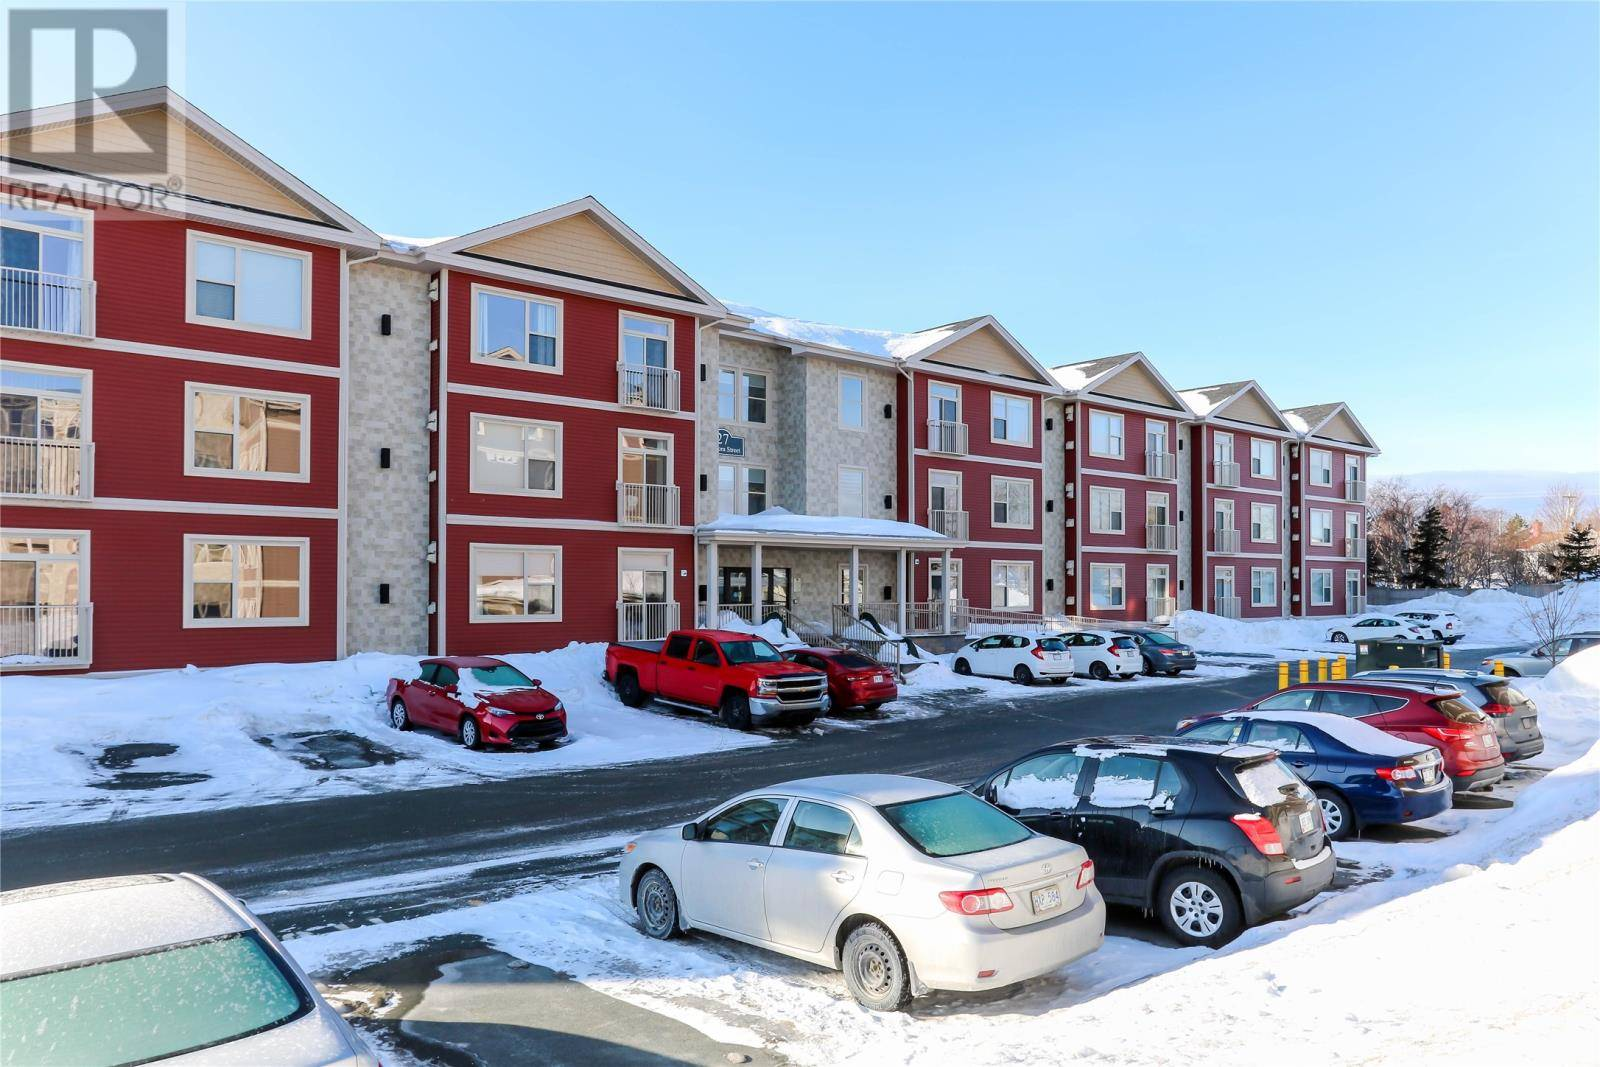 House for sale at 27 Rhodora St Unit 205 St. John's Newfoundland - MLS: 1211347